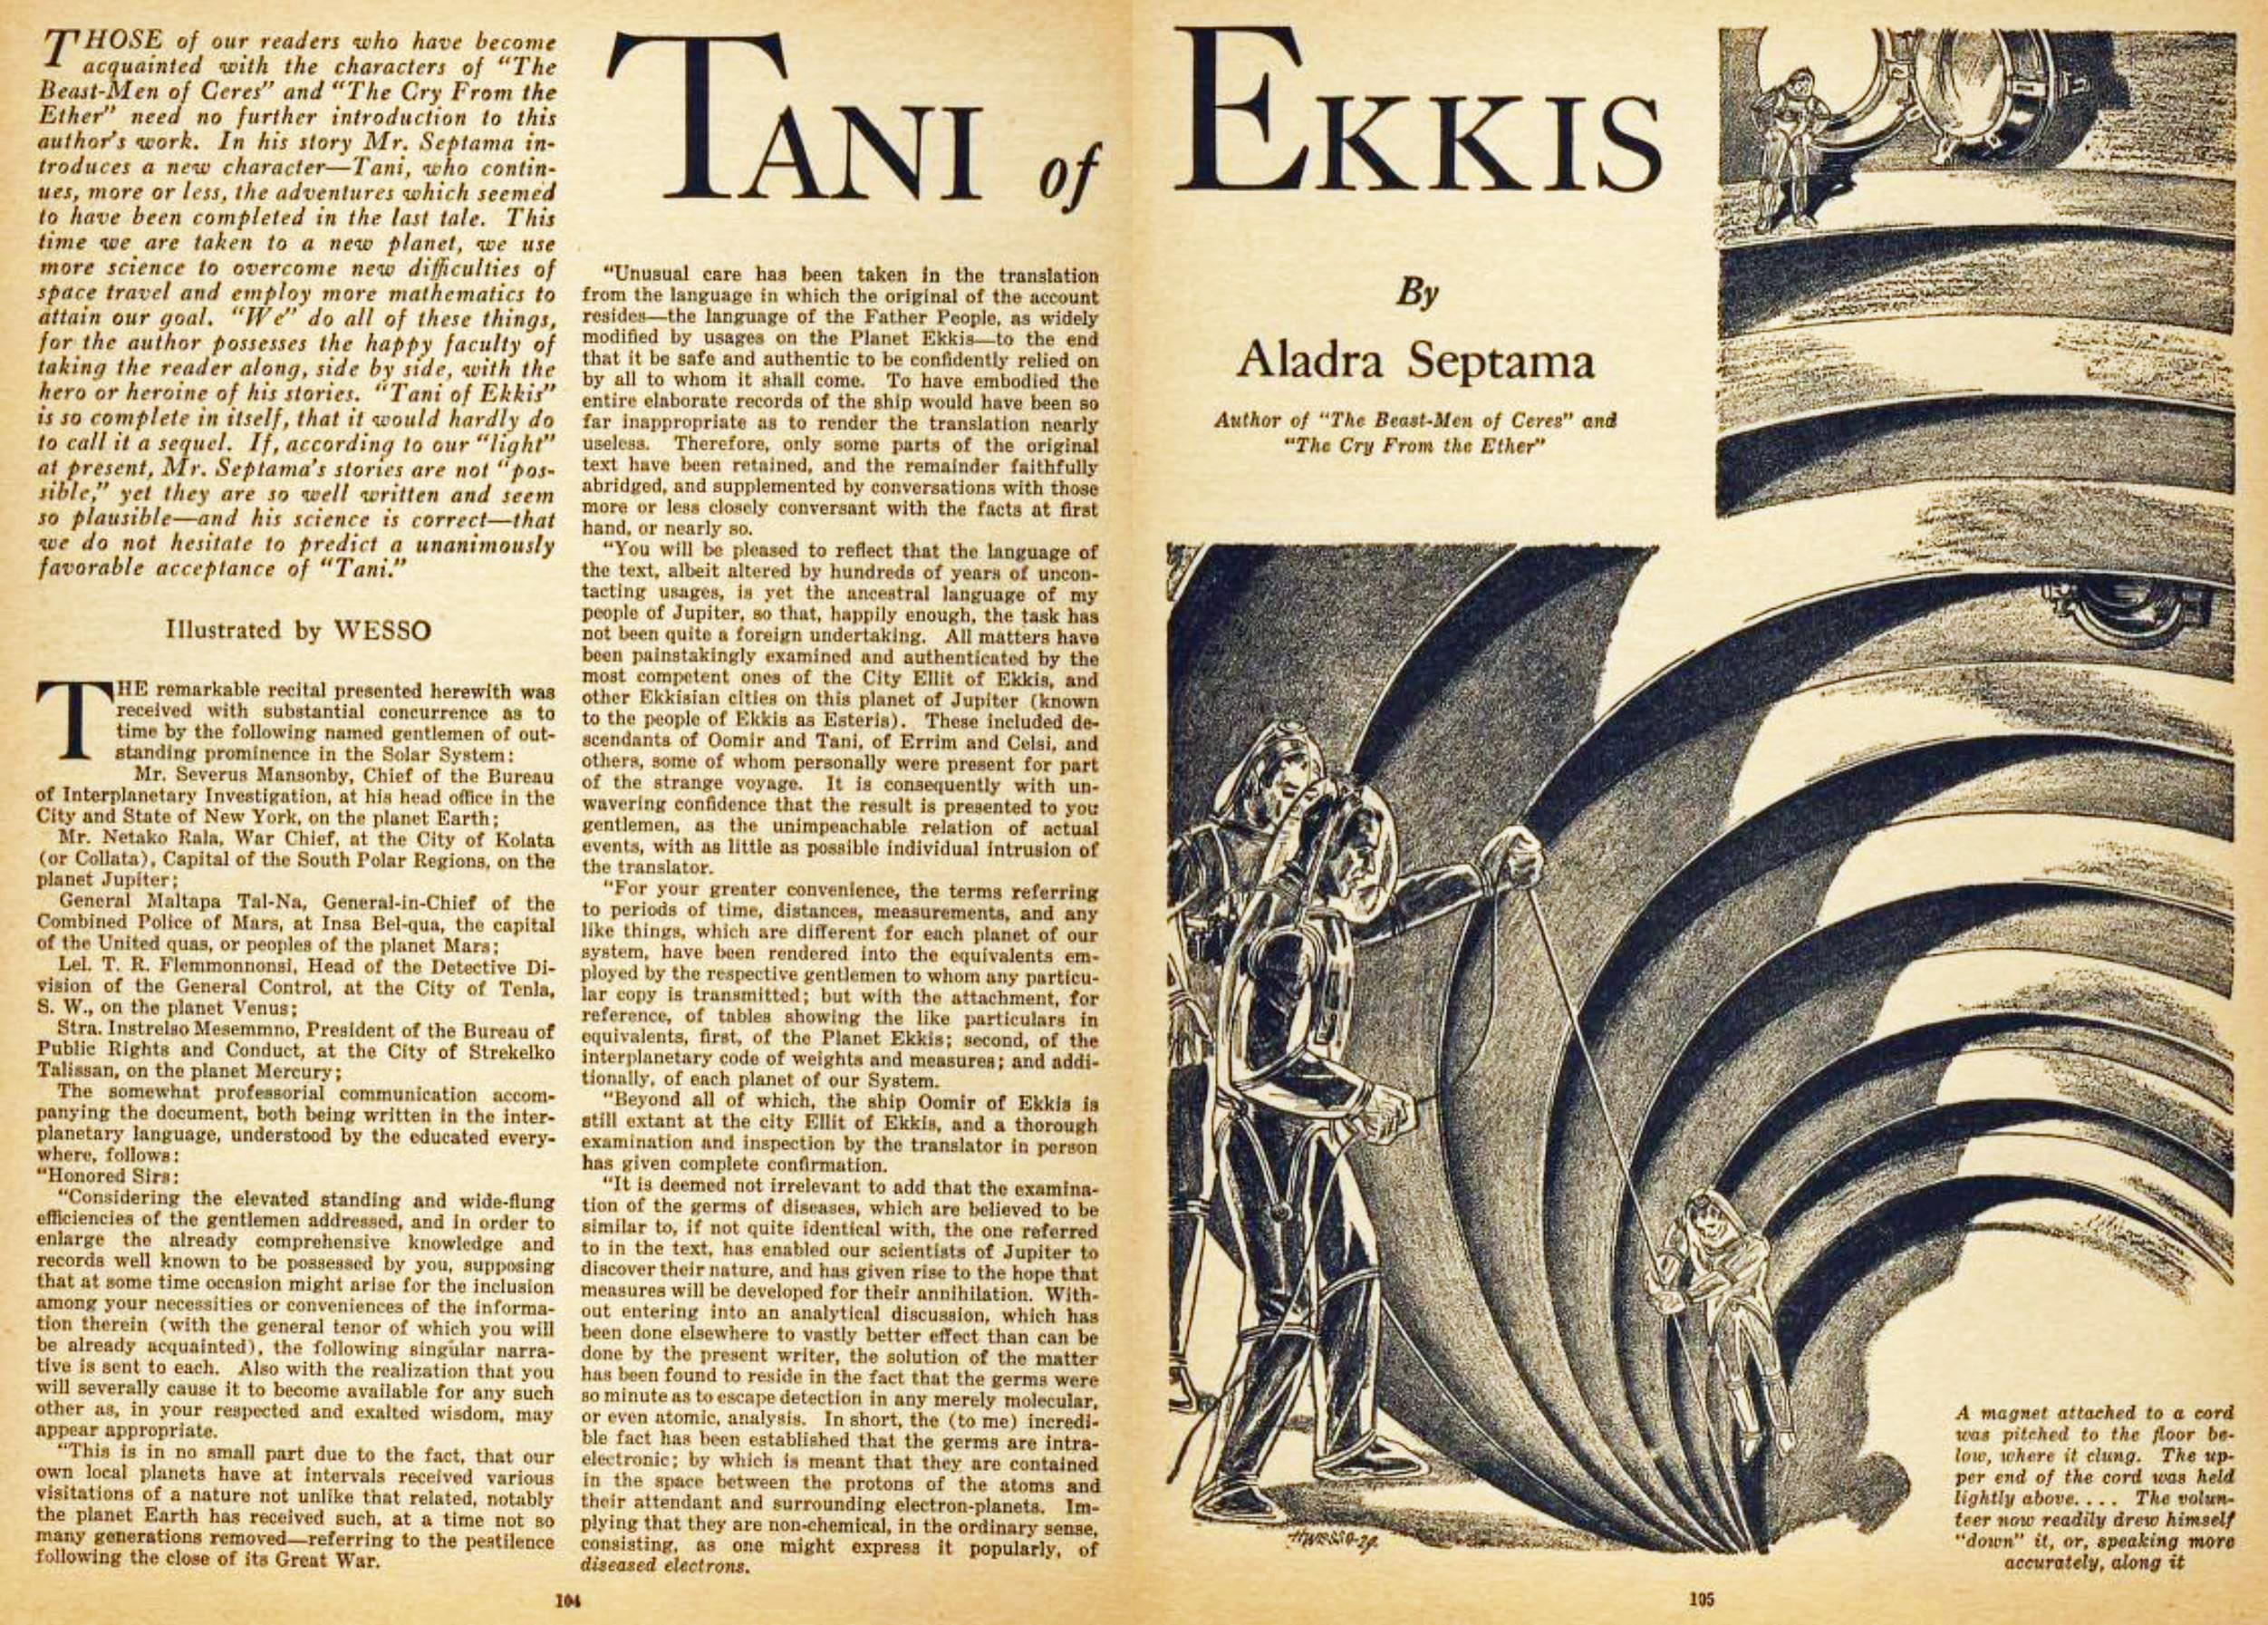 Tani of Ekkis by Aladra Septama